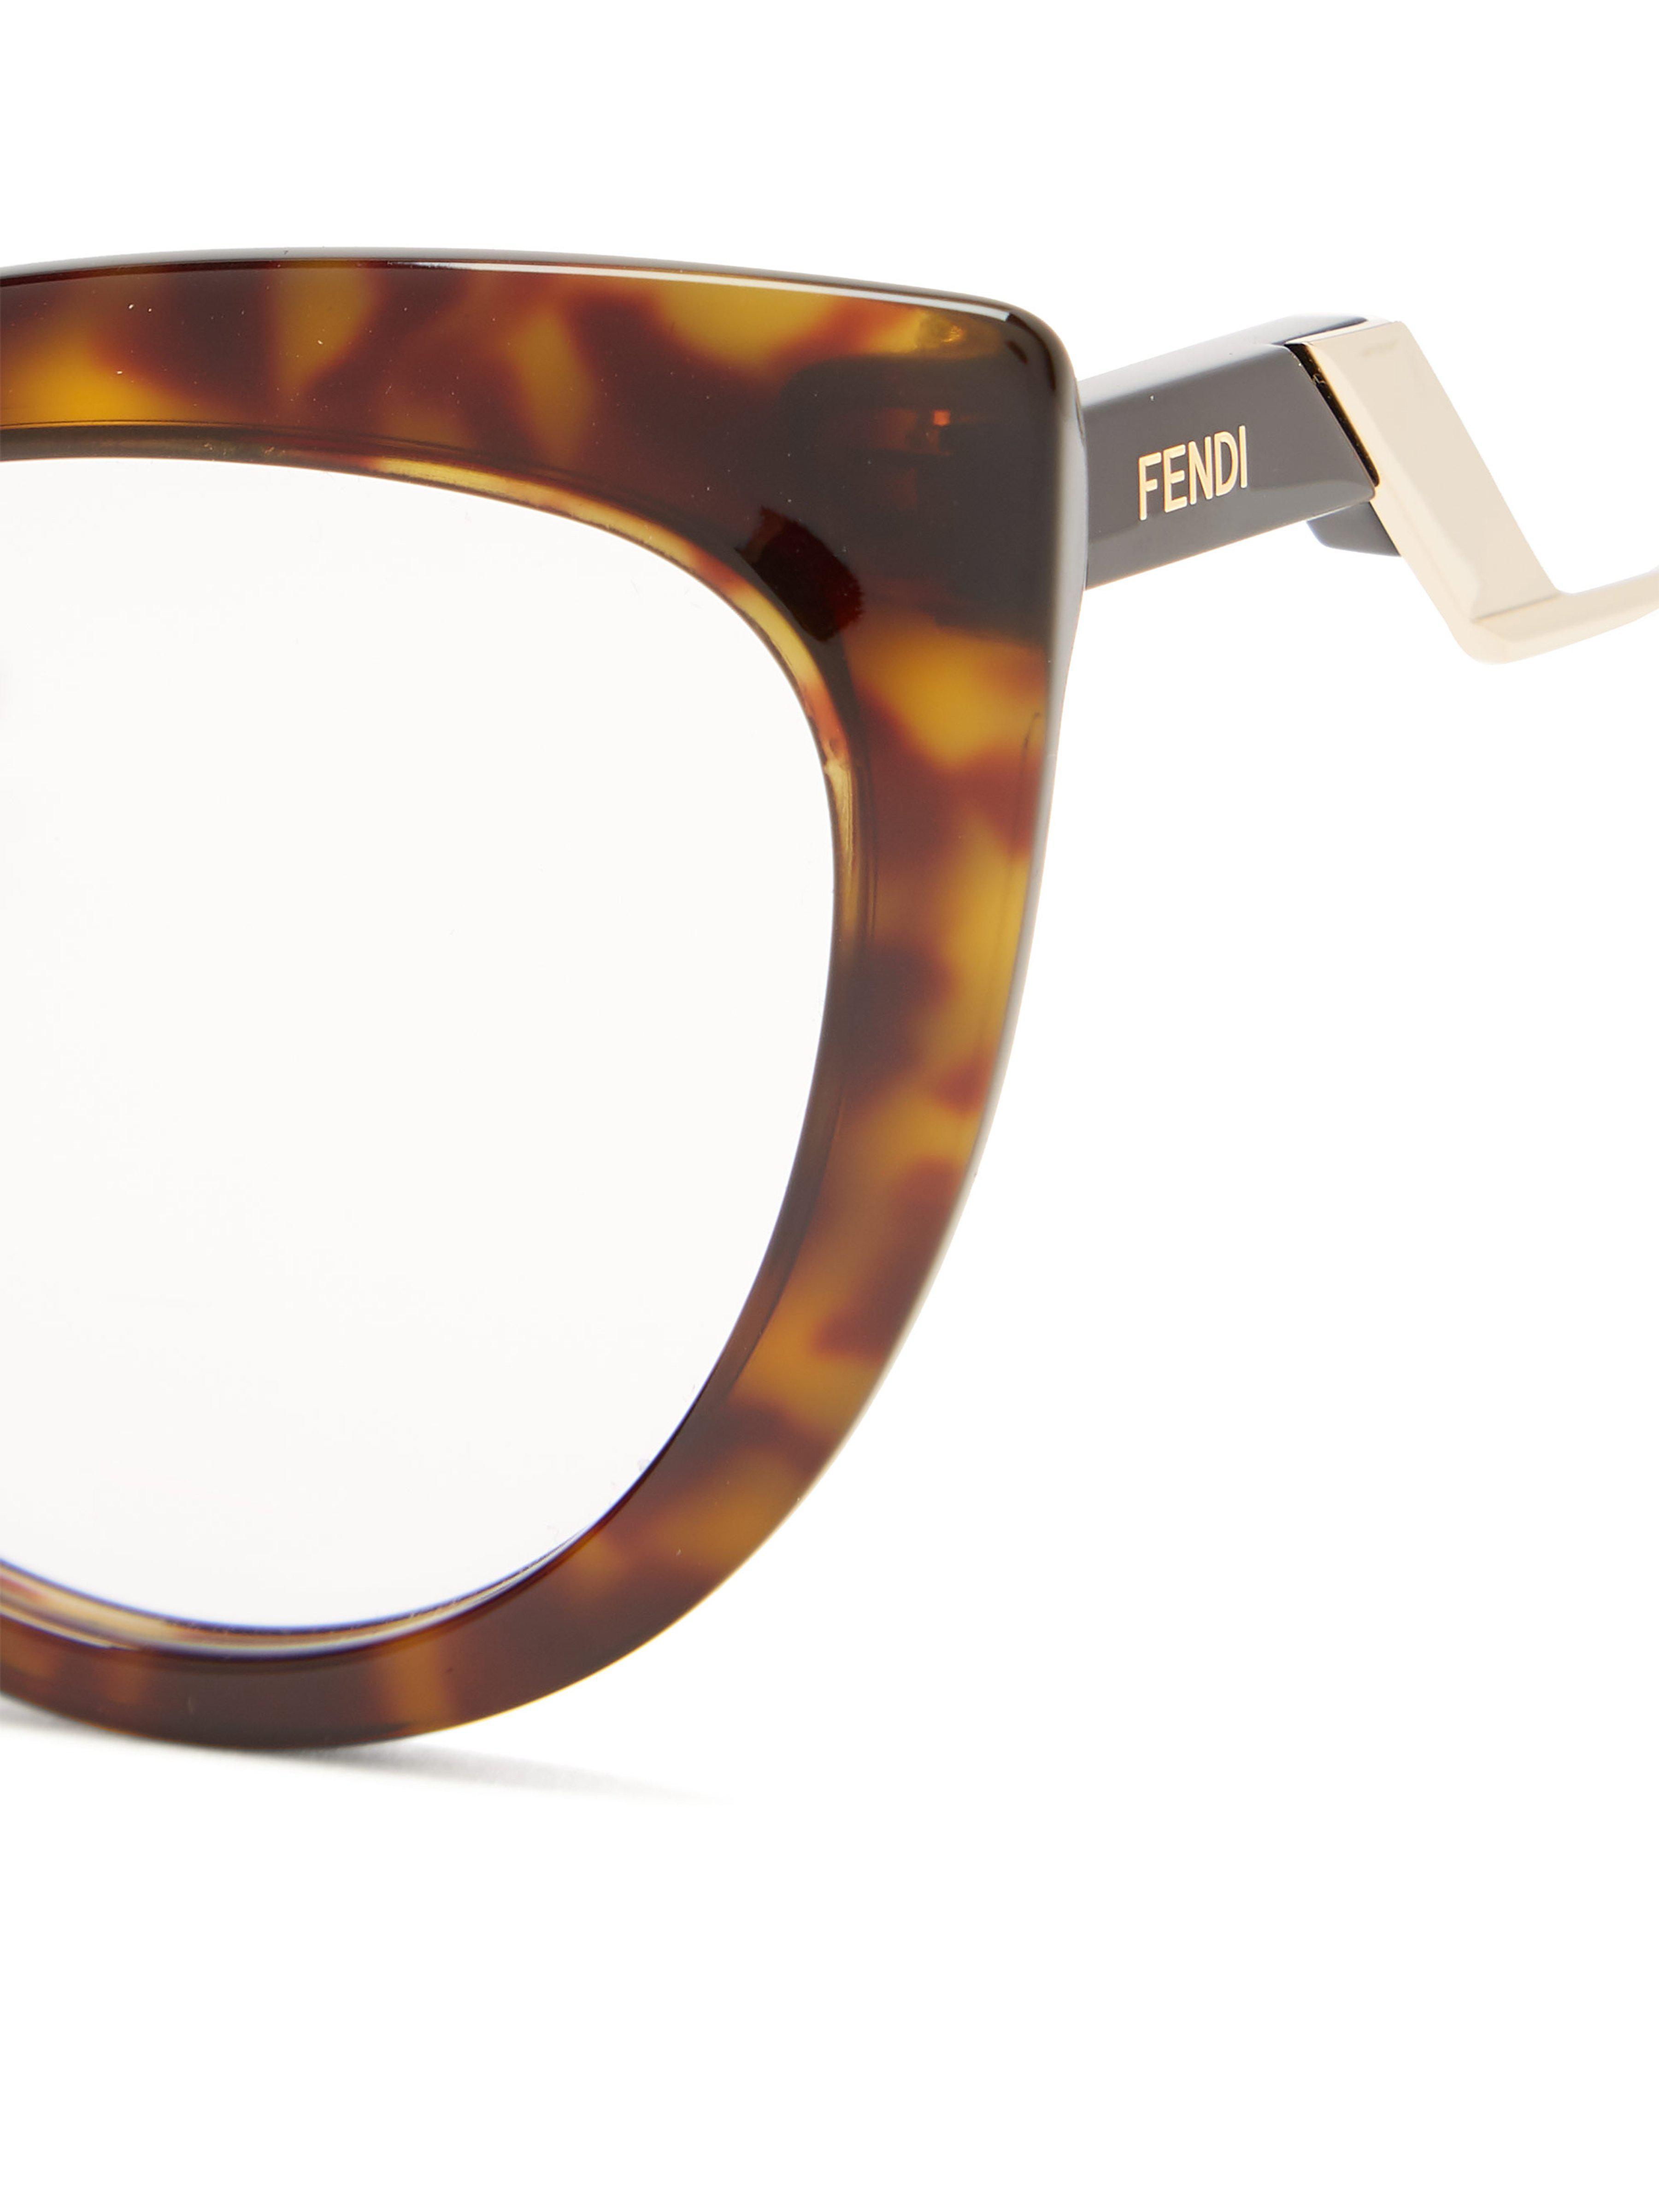 fa4c57e20354 ... Fendi - Brown Cat Eye Tortoiseshell Acetate Glasses - Lyst. Visit  MATCHESFASHION.COM. Tap to visit site